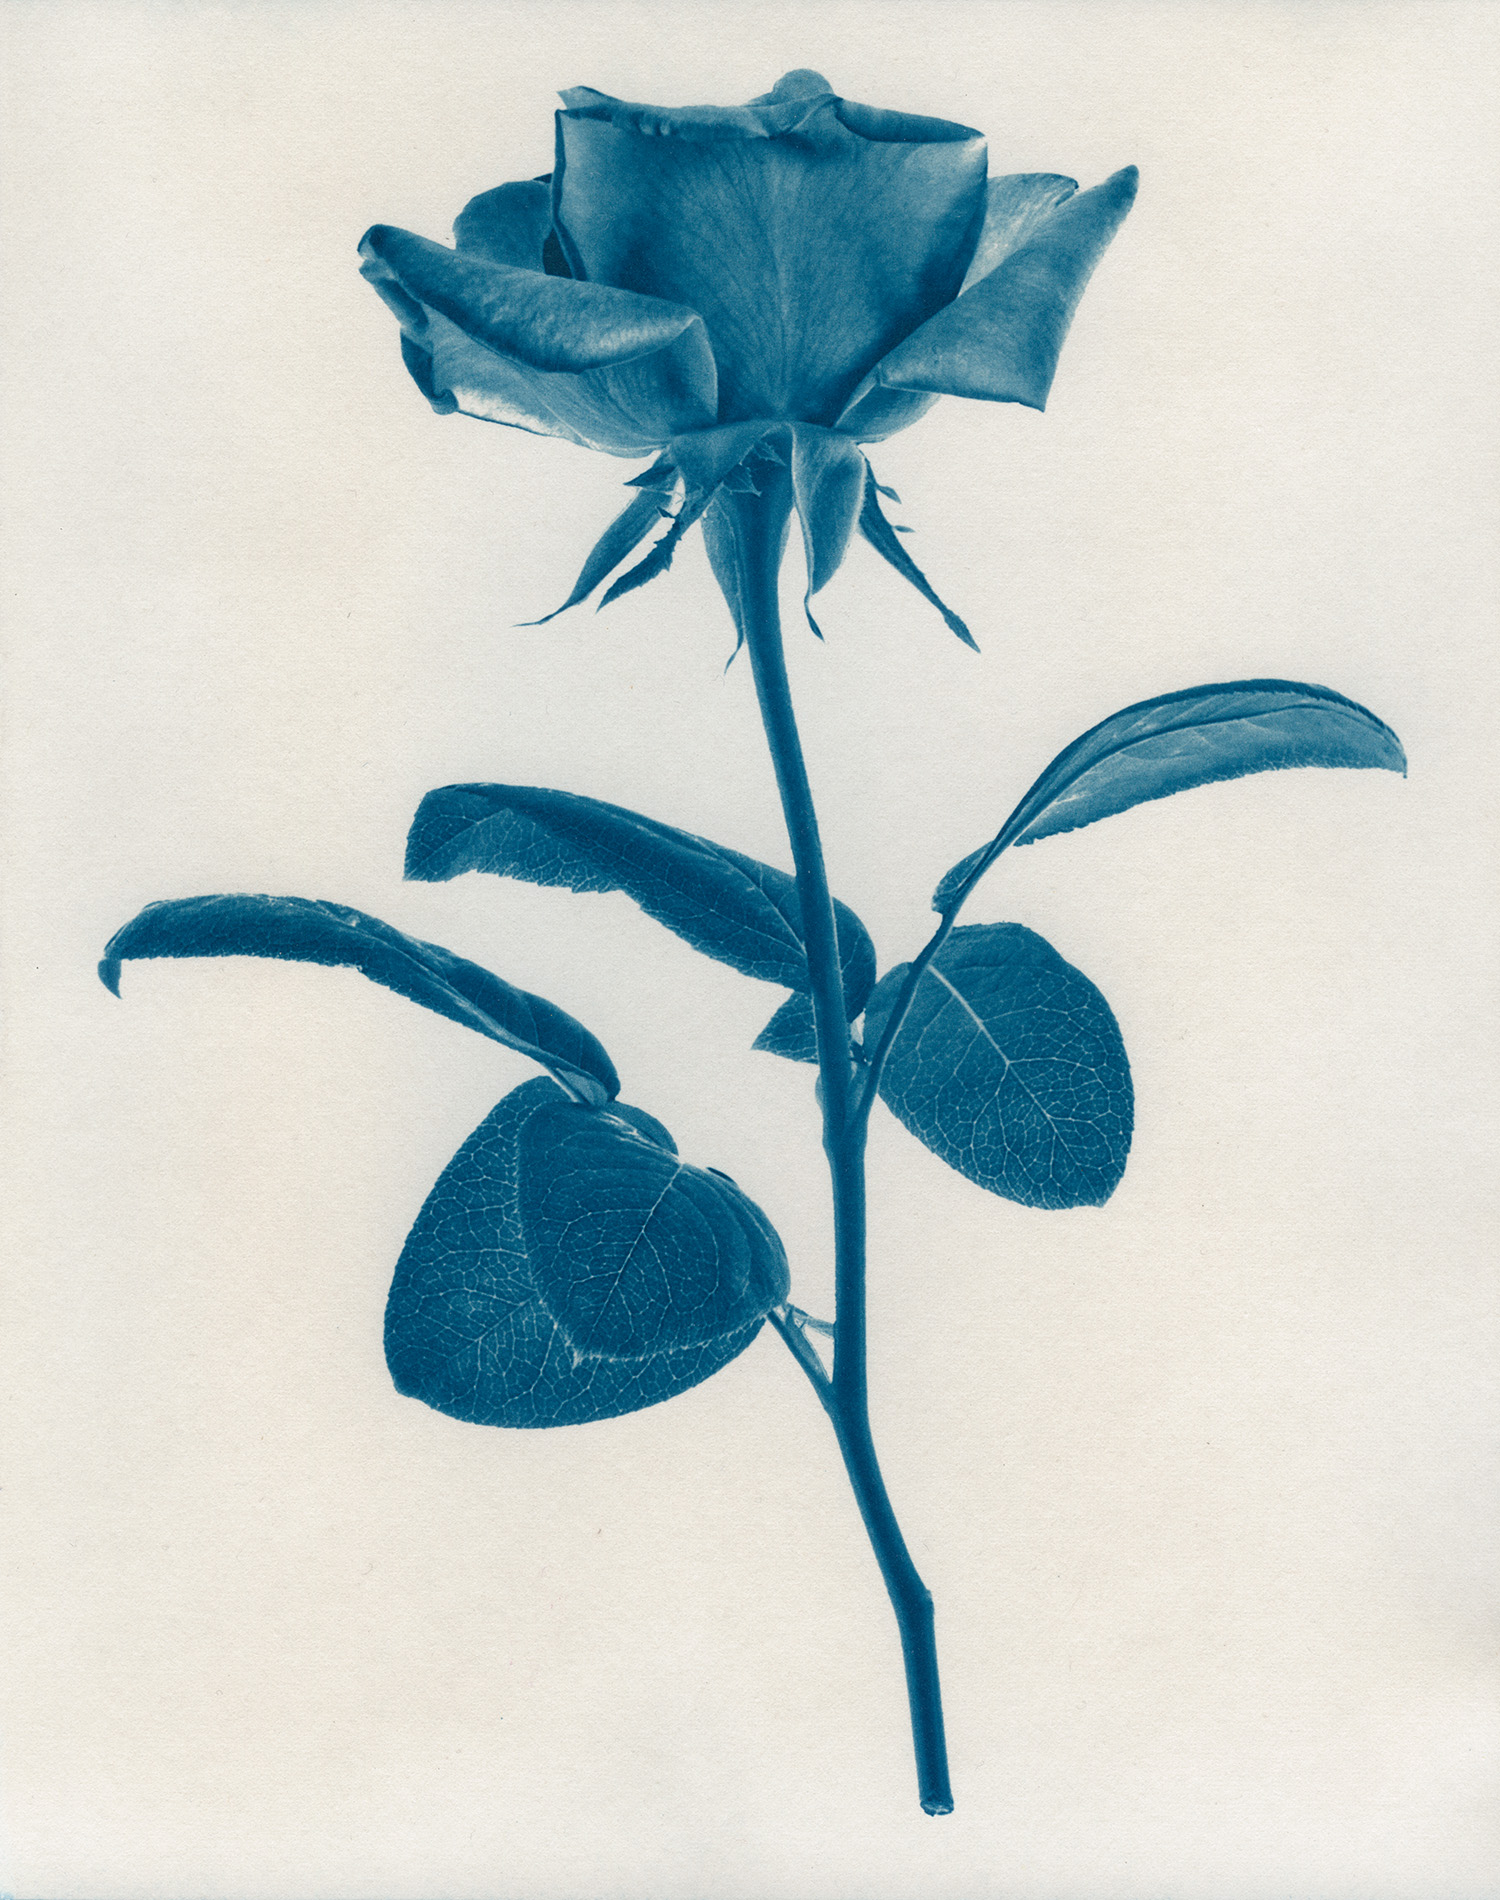 Cyan-Rose-1900x1500x72dpi-Sq.jpg